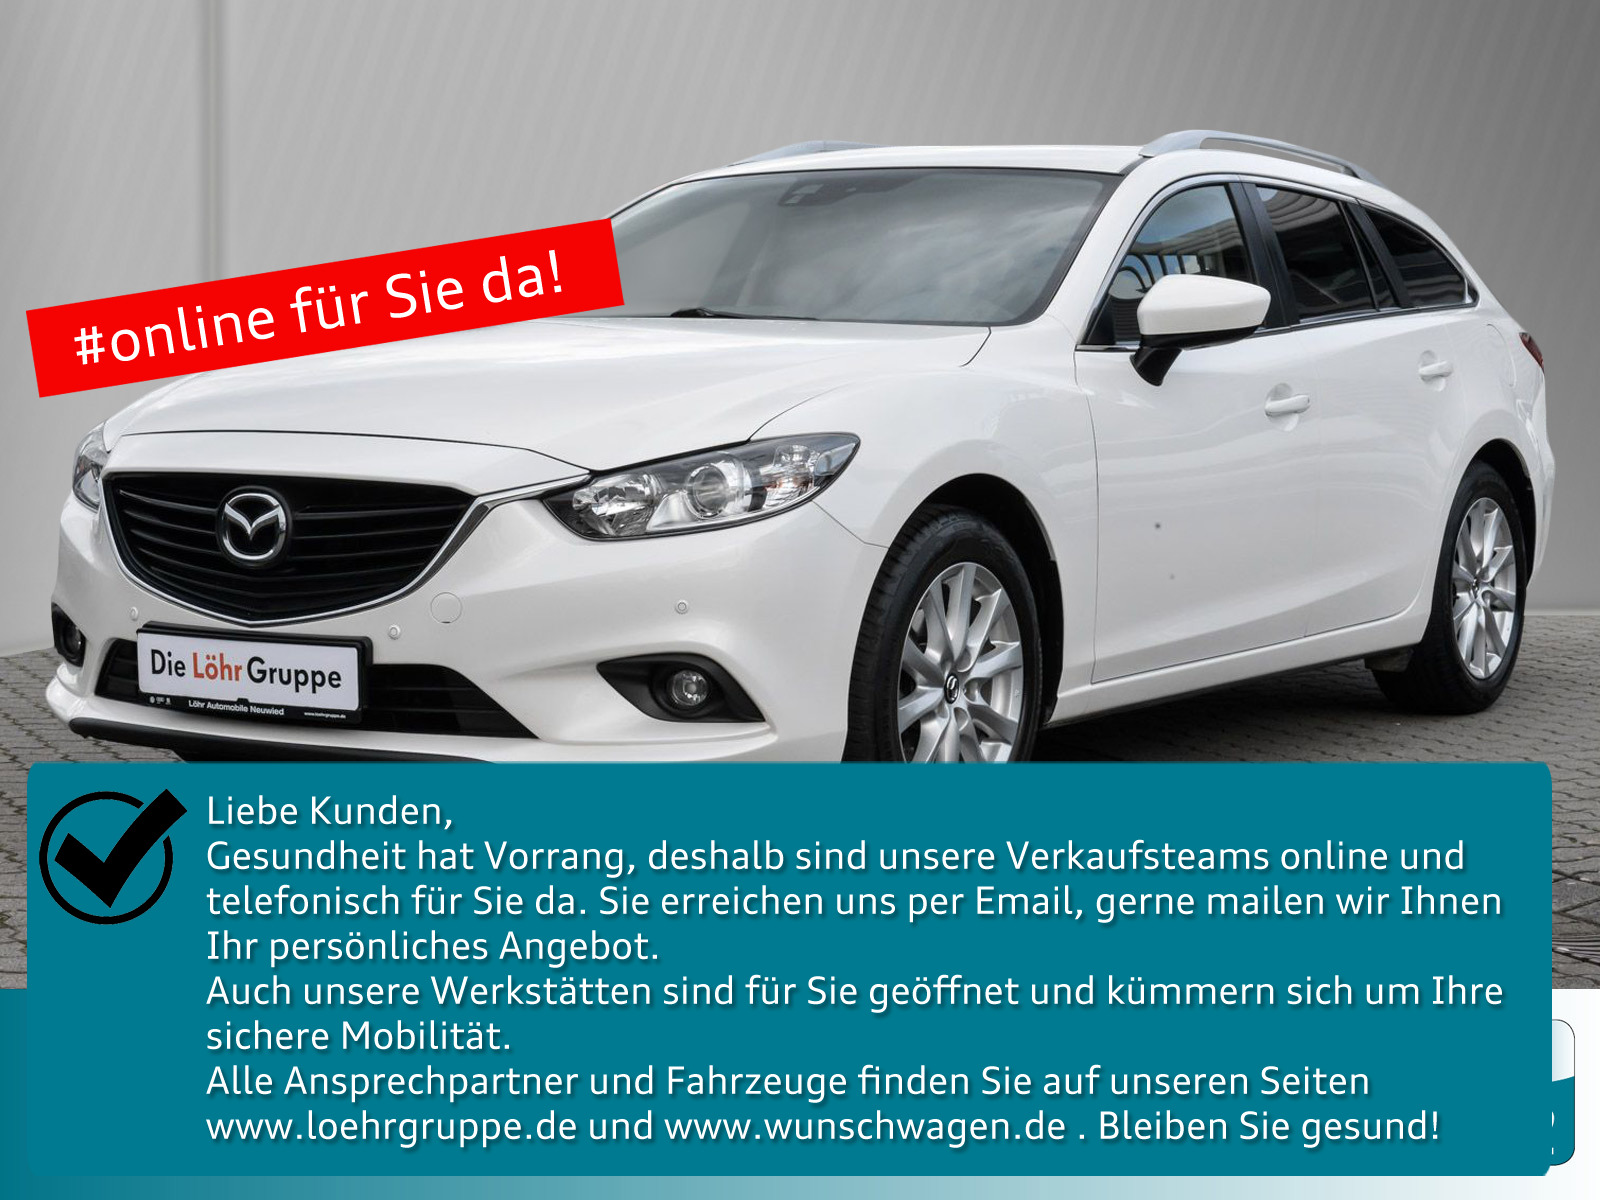 Mazda 6 2.0 Kombi Center-Line / Klimaautomatik/ Navi, Jahr 2015, Benzin